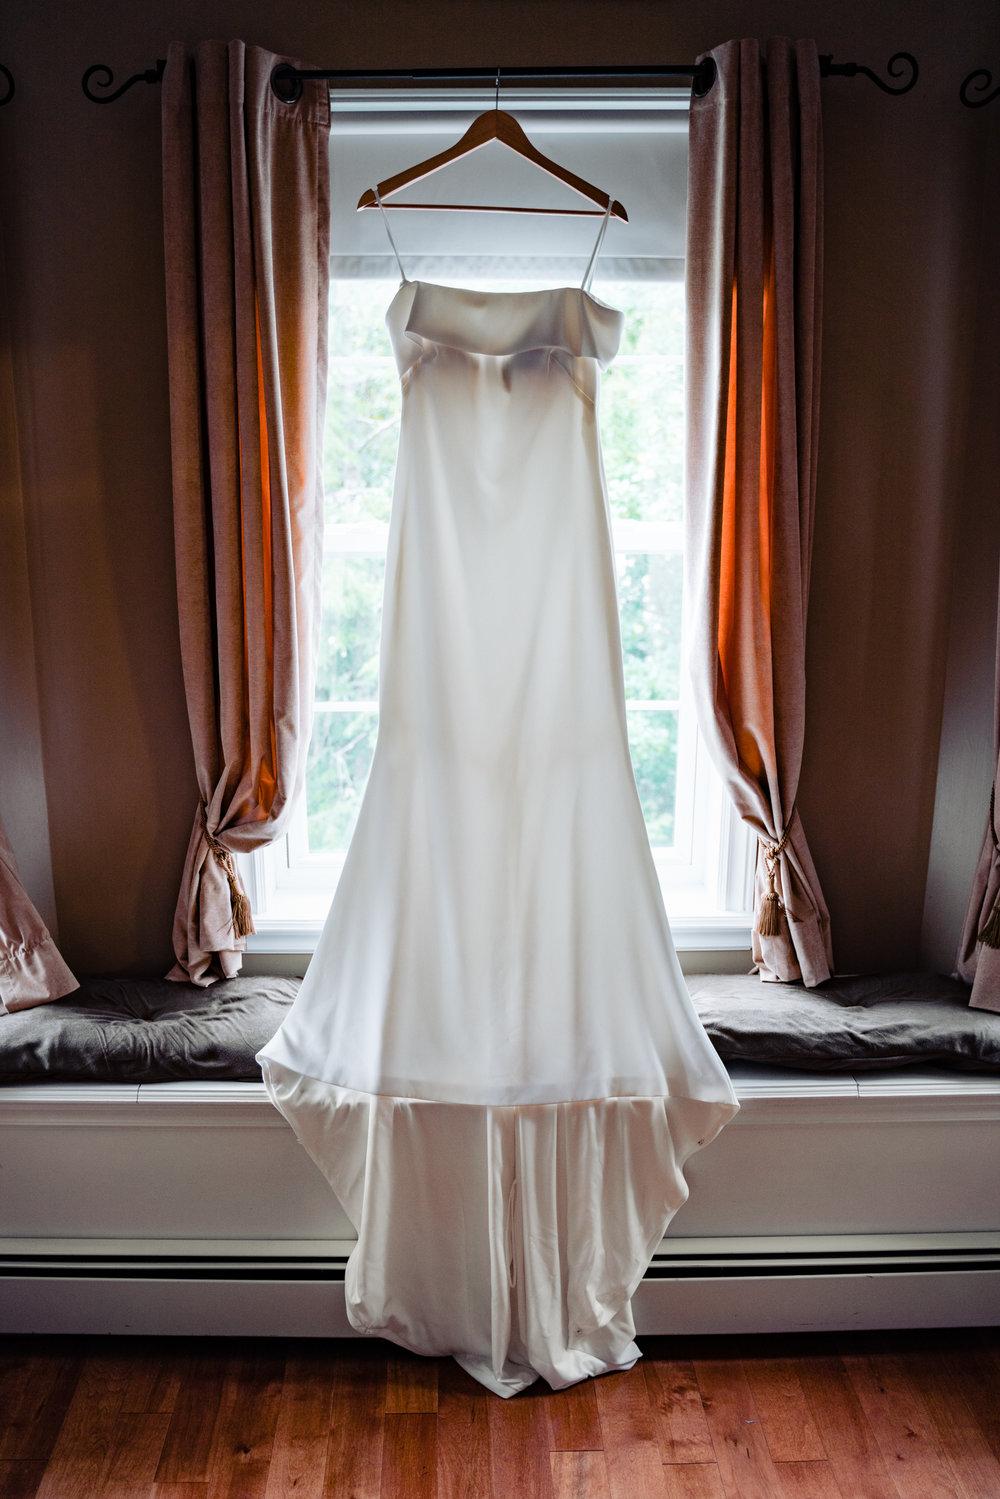 Halifax-wedding-photography-foxandfellow-nova-scotia-backyard-summer-canada-4.jpg